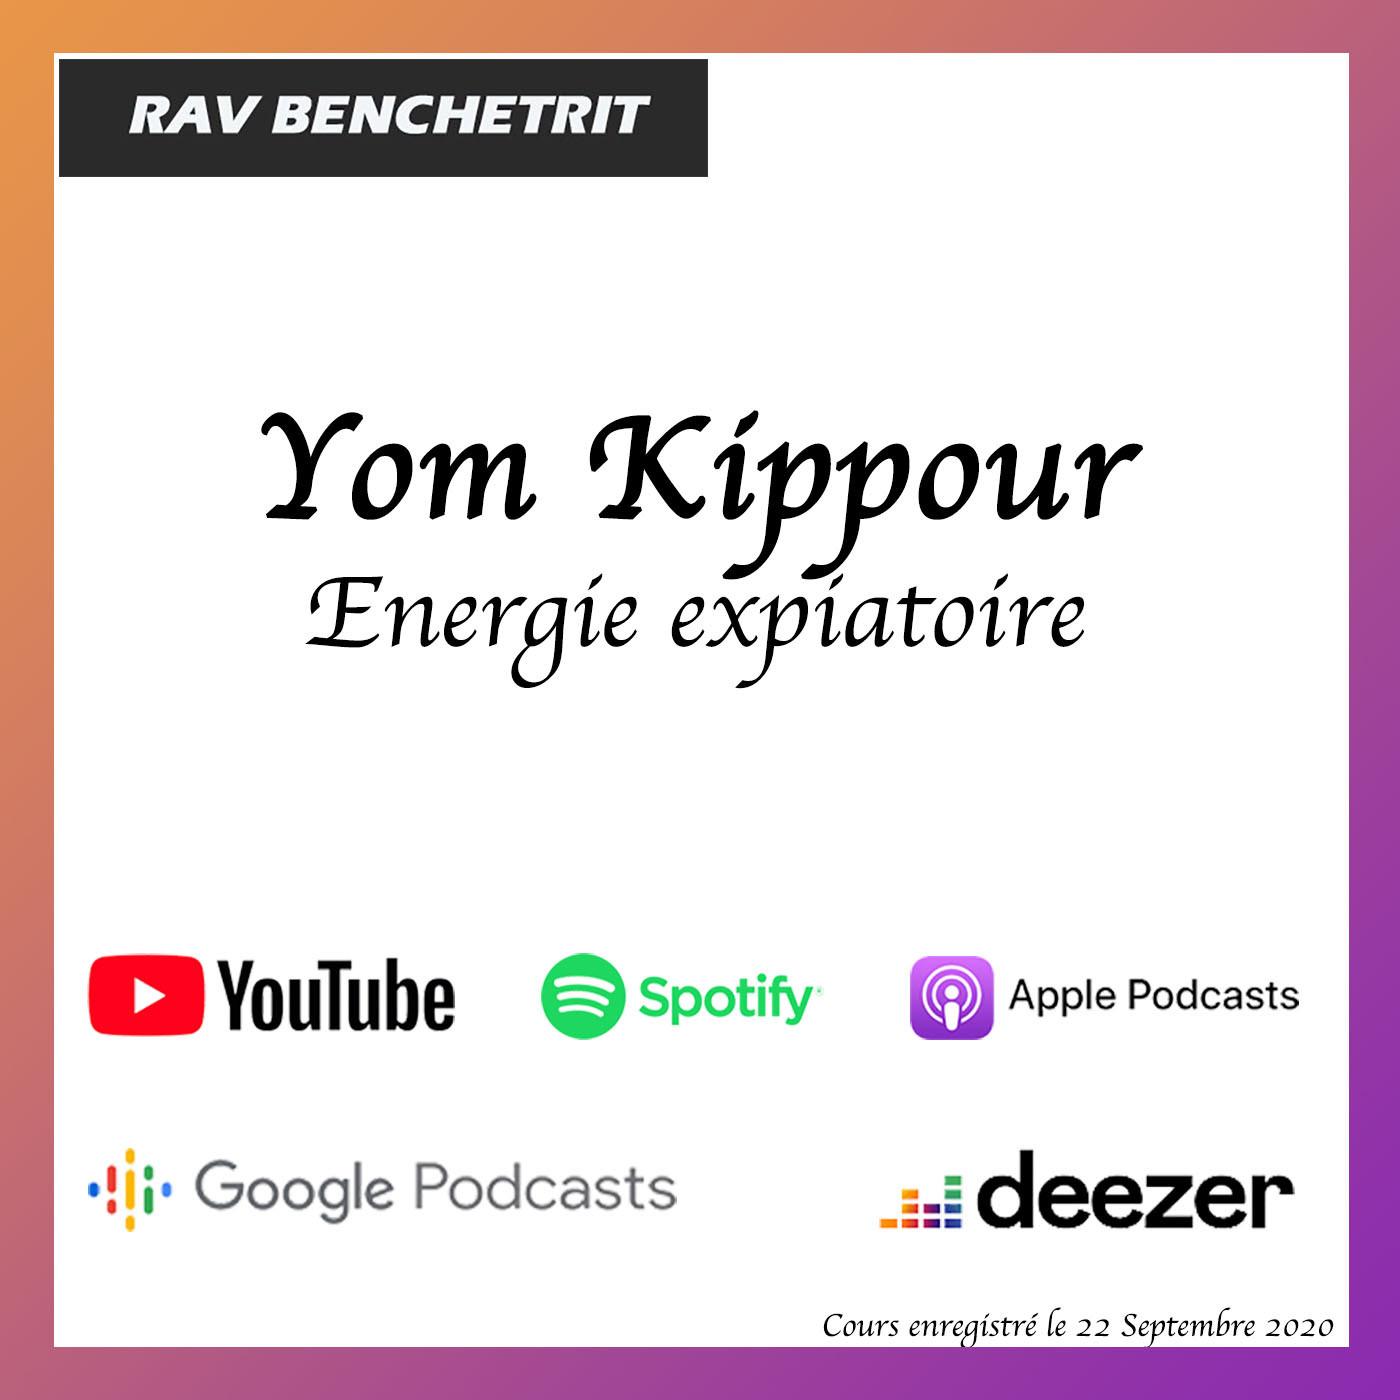 Kippour, Energie Expiatoire